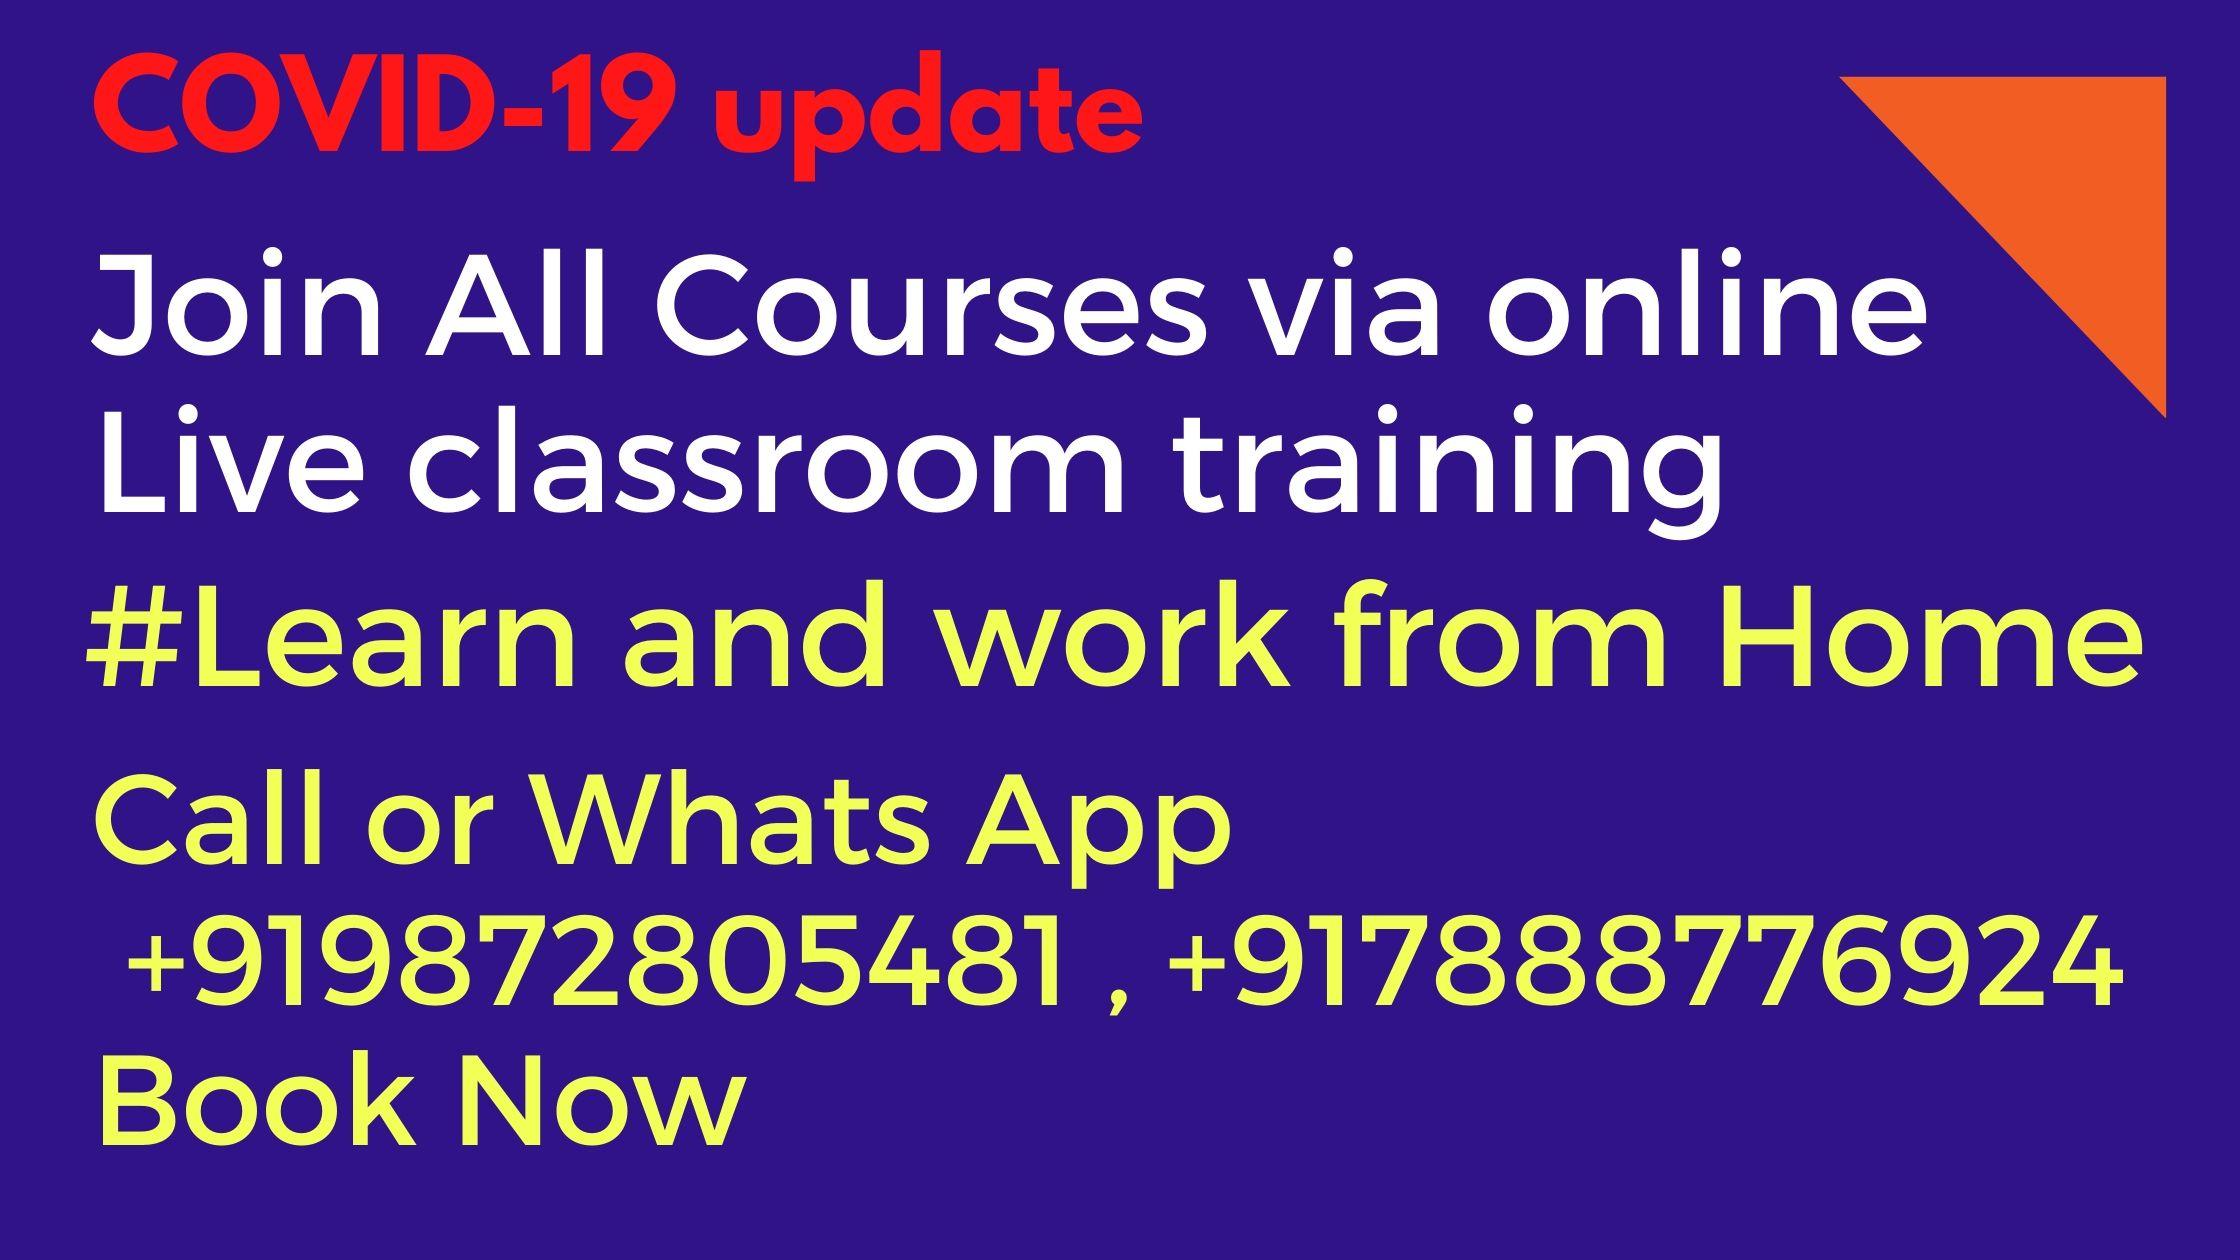 digital marketing course in chandigarh Digital Marketing Course In Chandigarh and Mohali With Netmax covid update 2